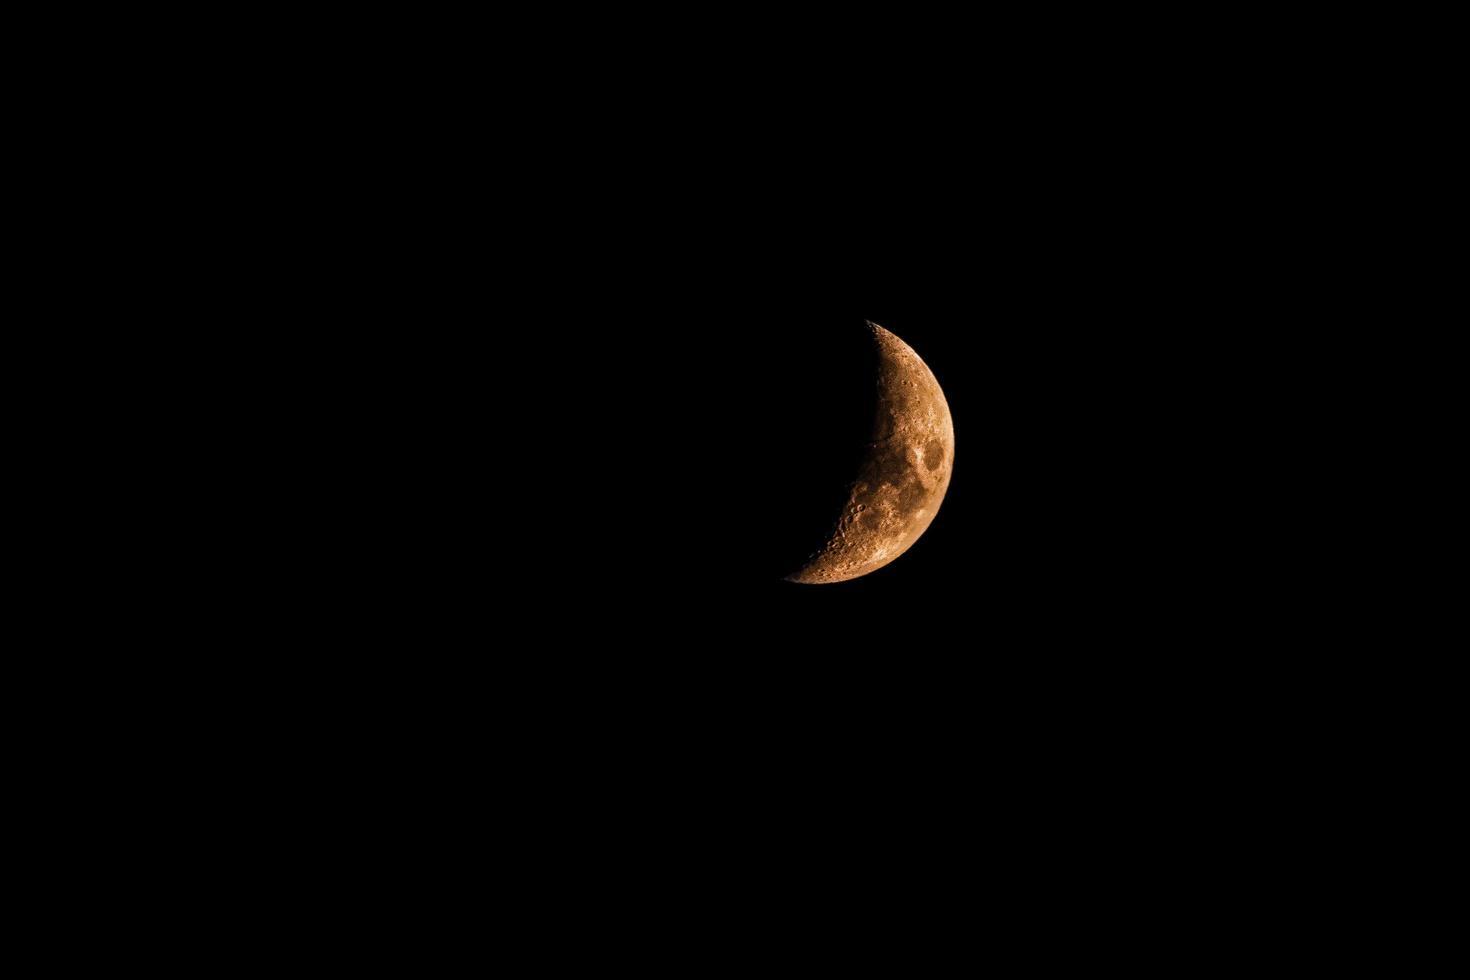 luna crescente arancione foto